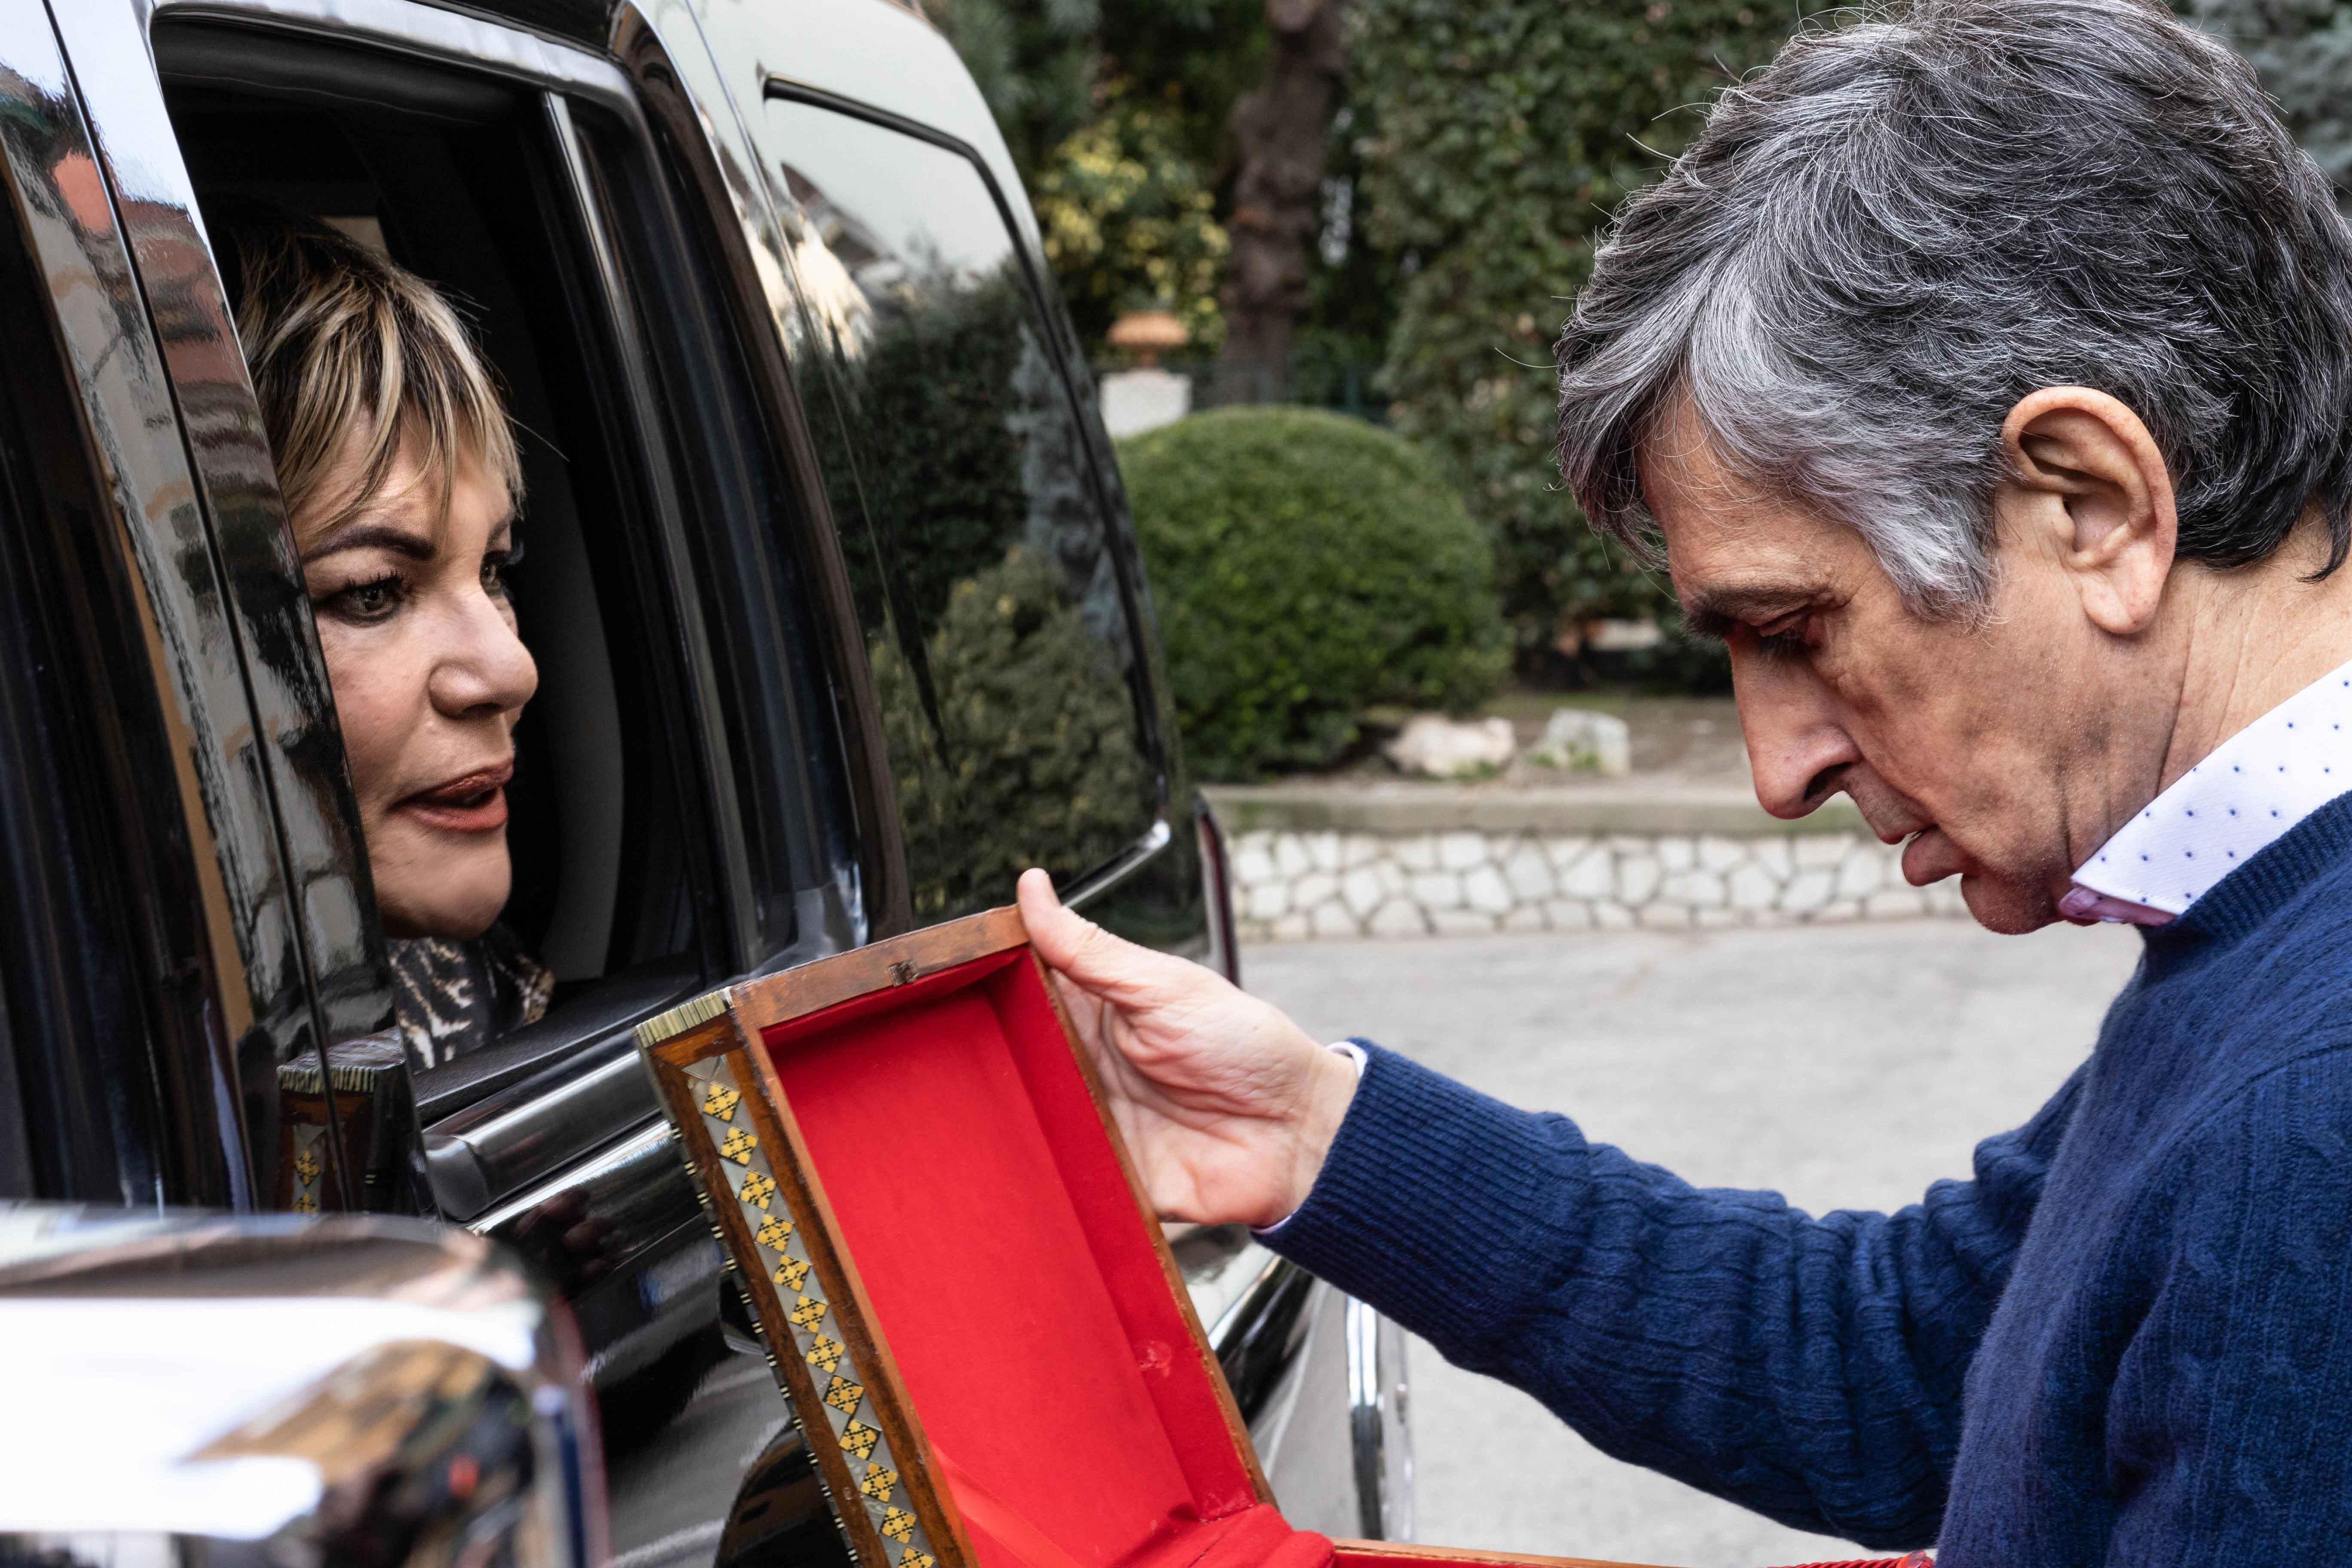 Cristina Donadio e Vincenzo Salemme